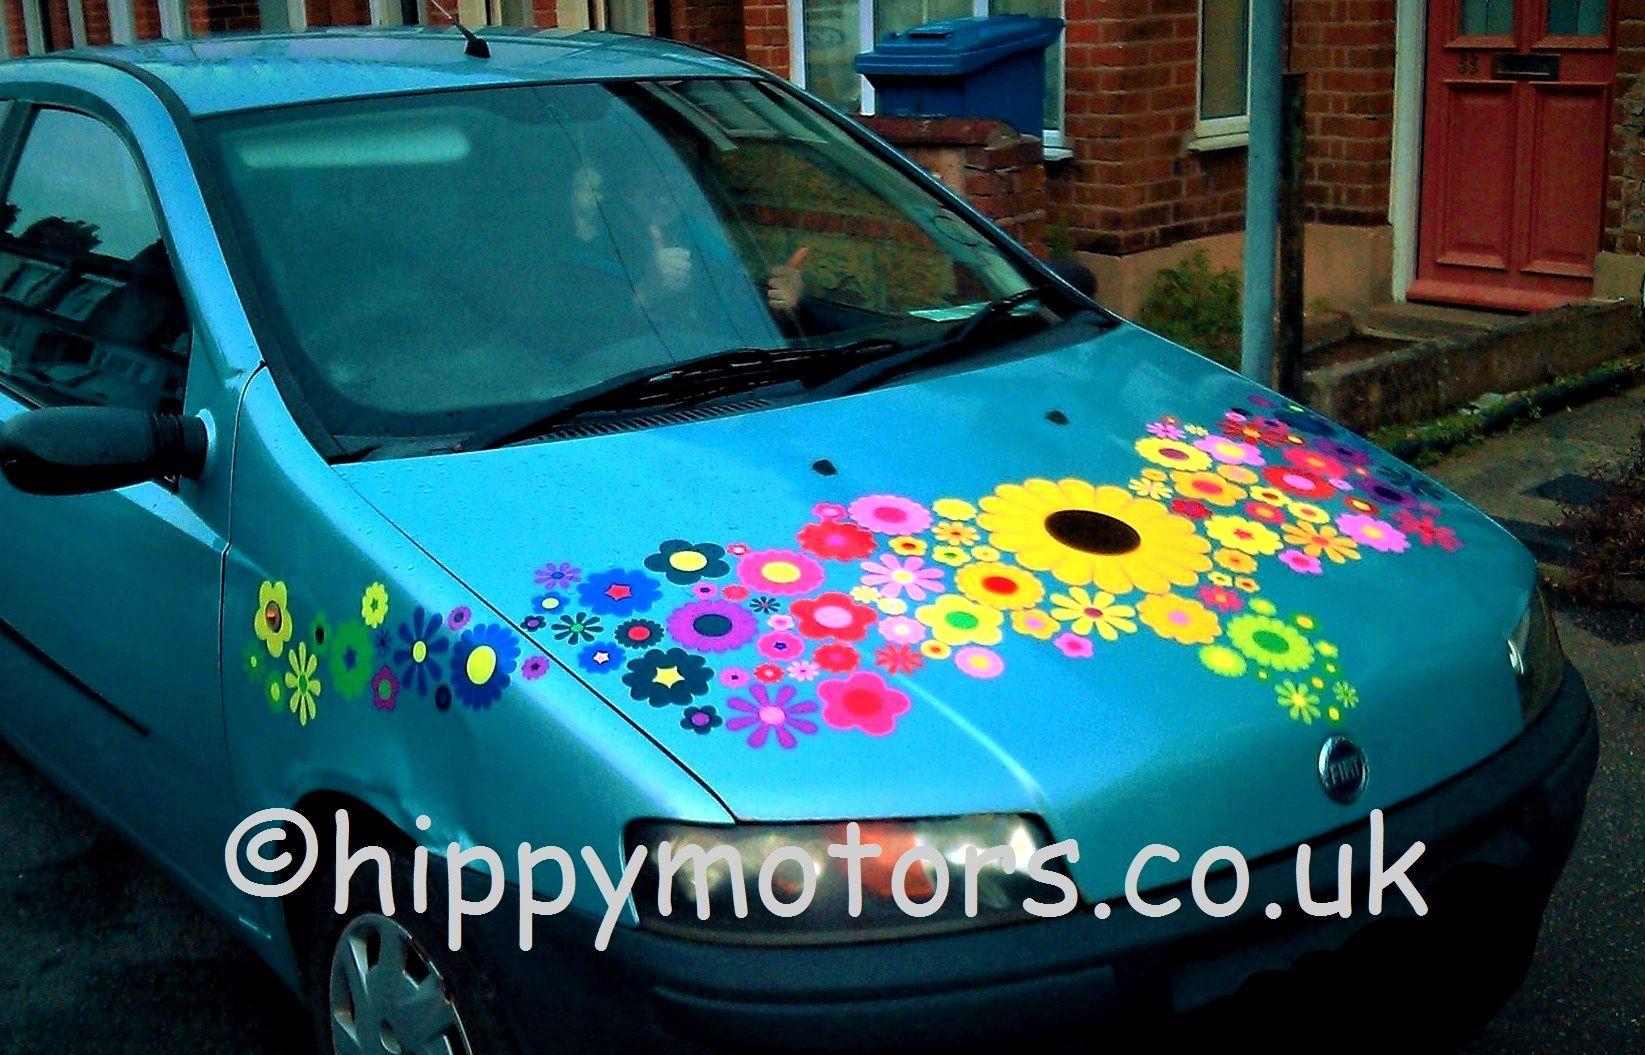 Flower Car Bonnet Vinyl Stickers Flower Car Car Cute Cars [ 1055 x 1645 Pixel ]